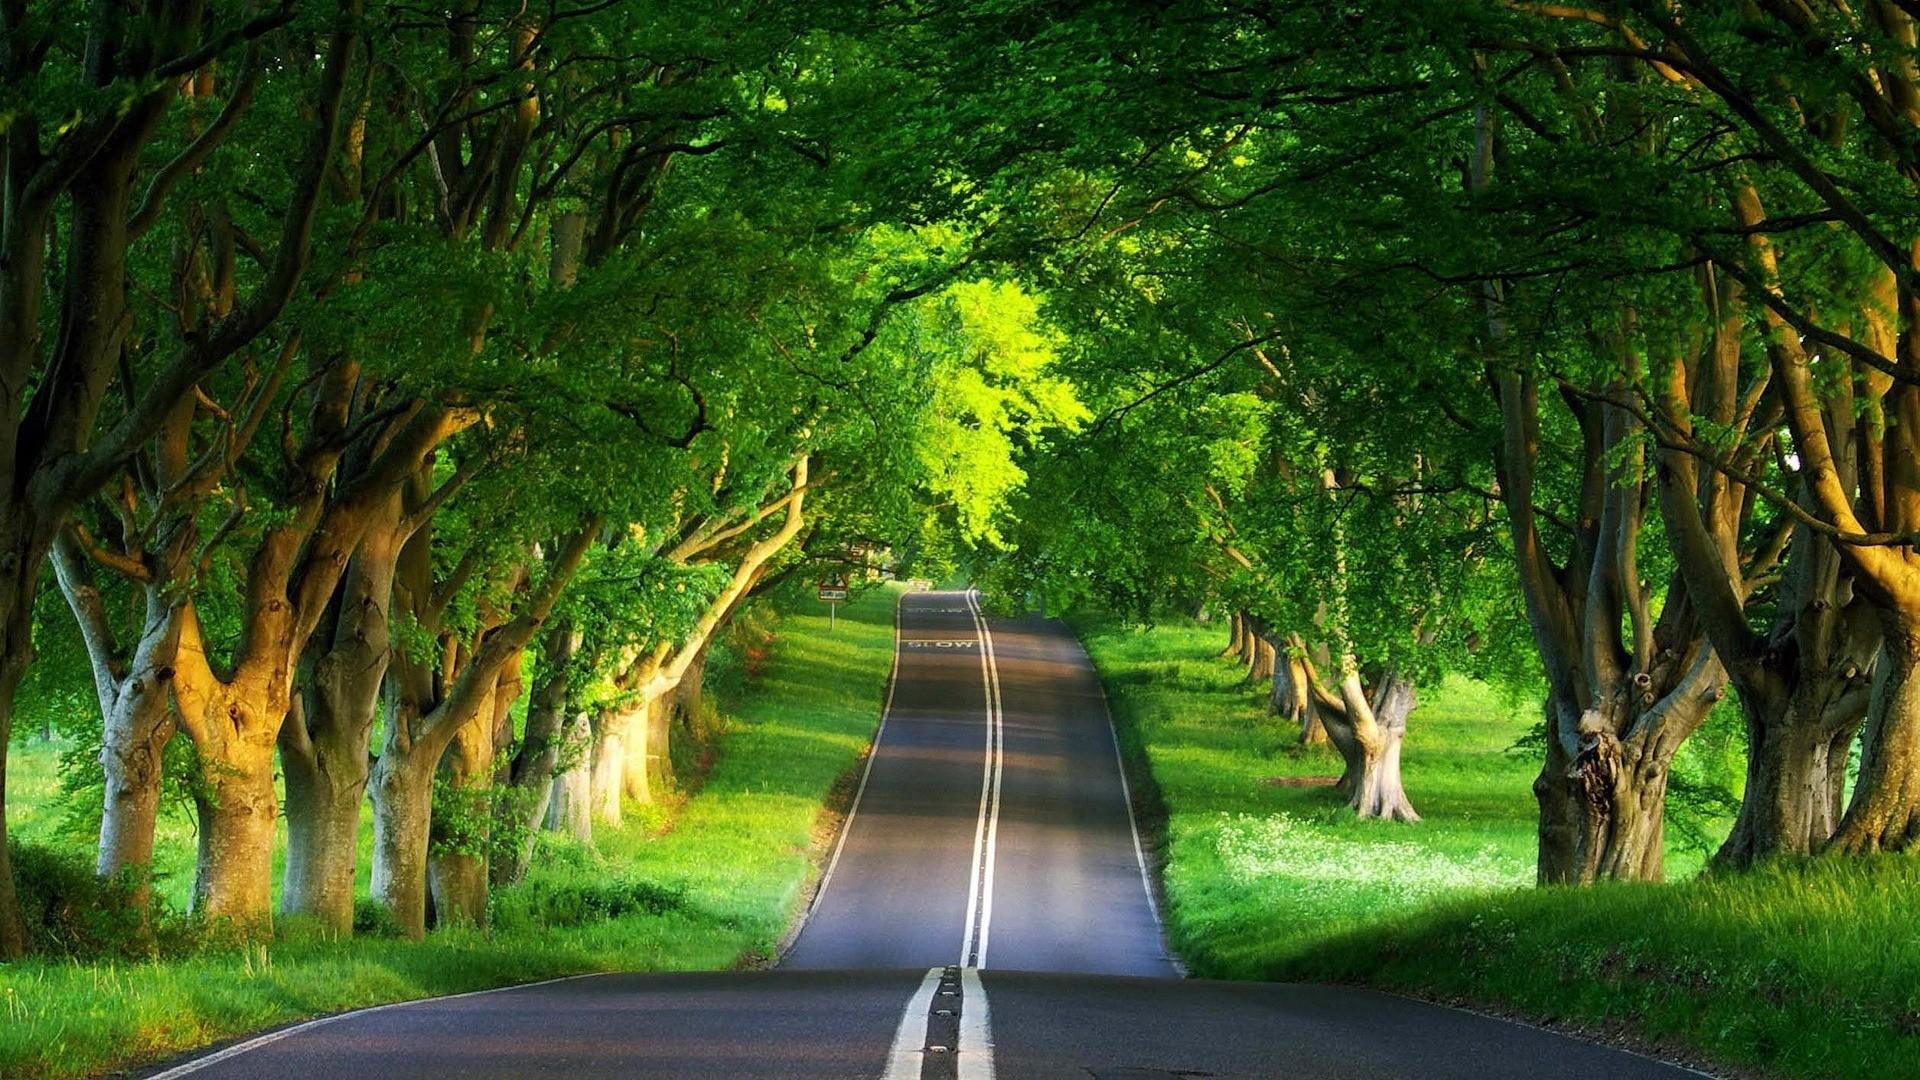 Beautiful Scenery Wallpaper Desktop Wallpaper   scenery desktop wallpapers  natural beautiful road summer wallpaper .